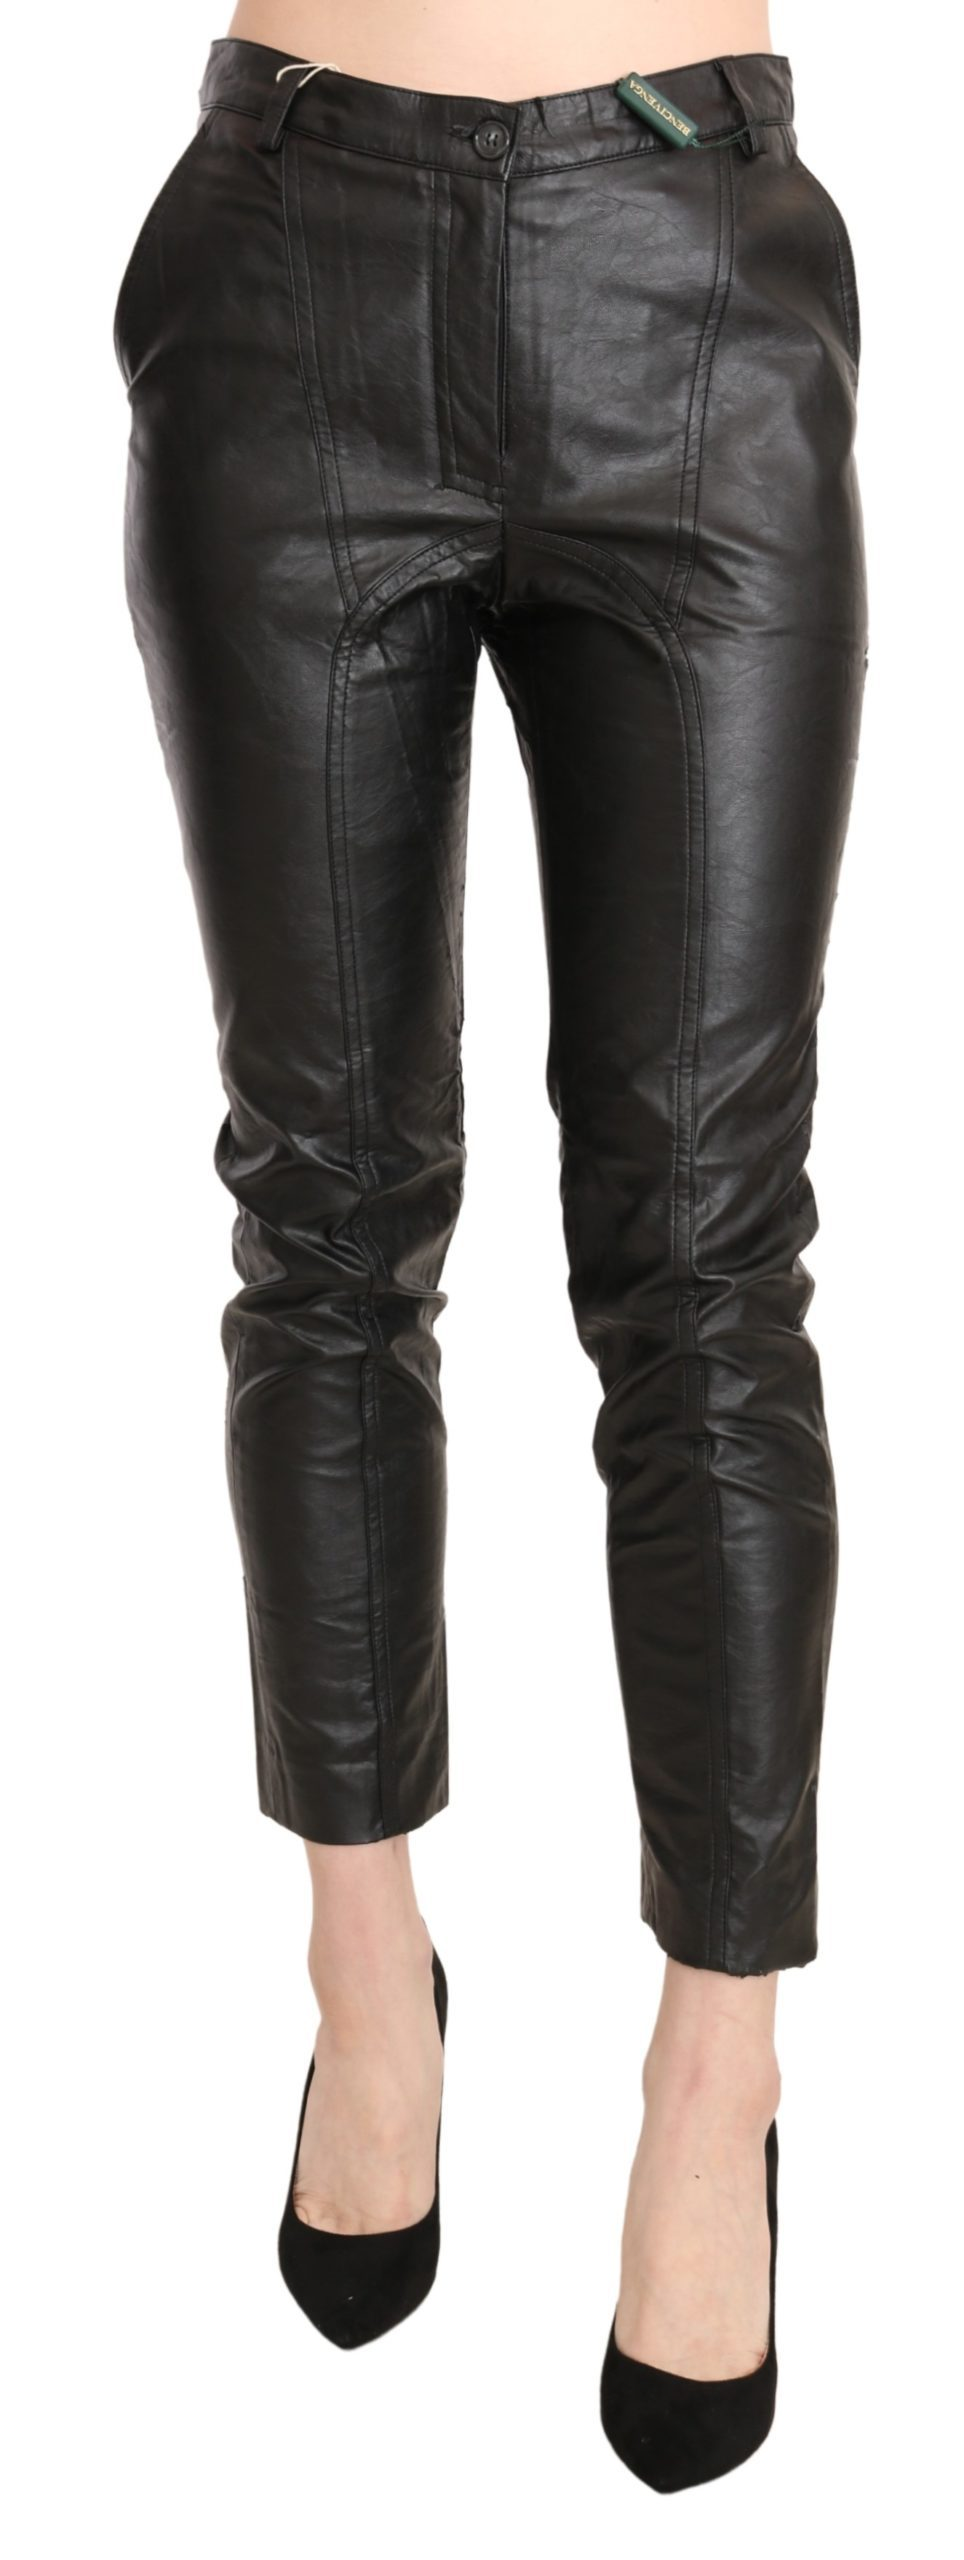 BENCIVENGA Women's Leather High Waist Skinny Trousers Black PAN71371-44 - IT44 L